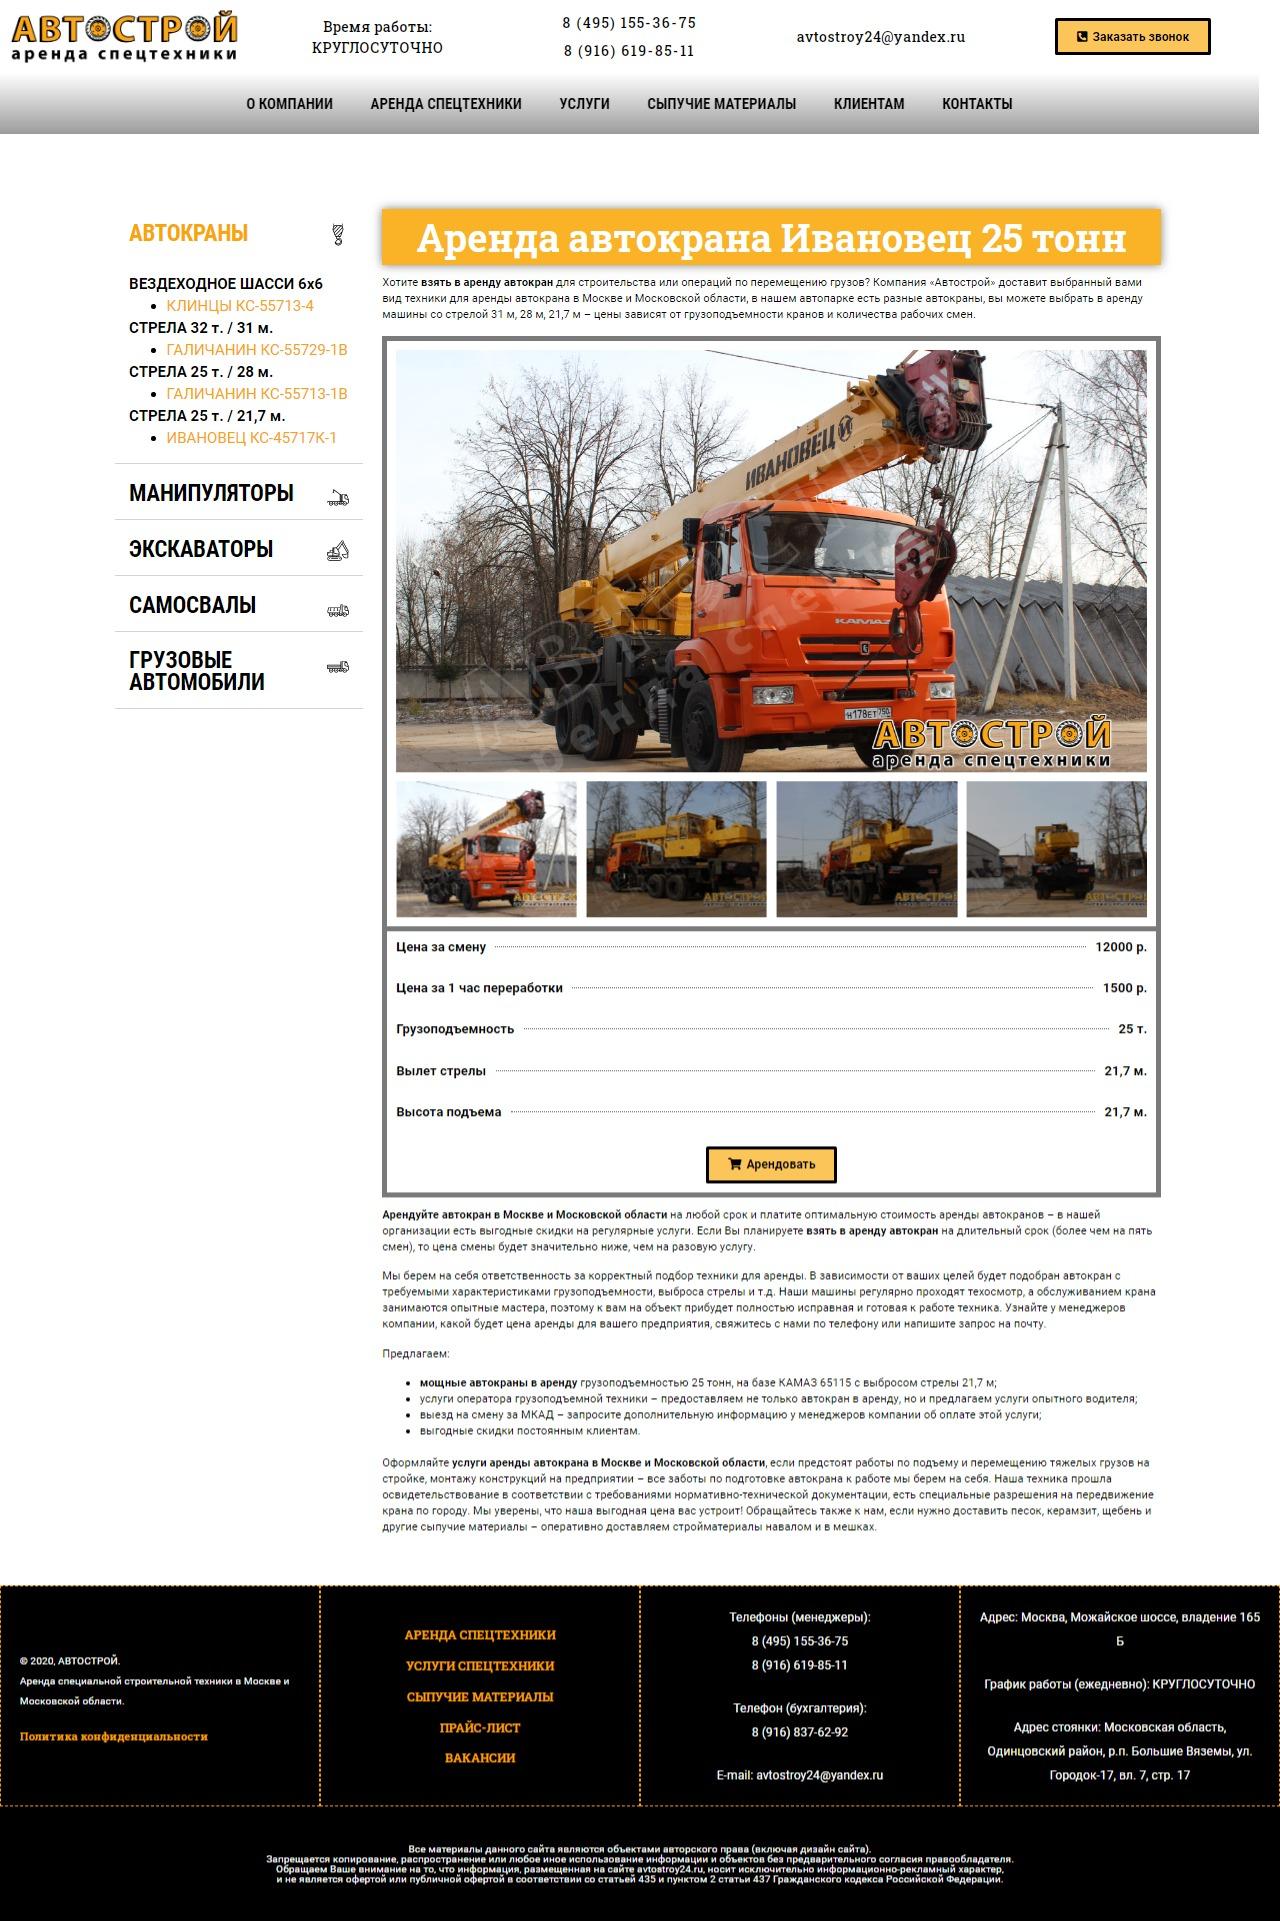 Бизнес-сайт Avtostroy24